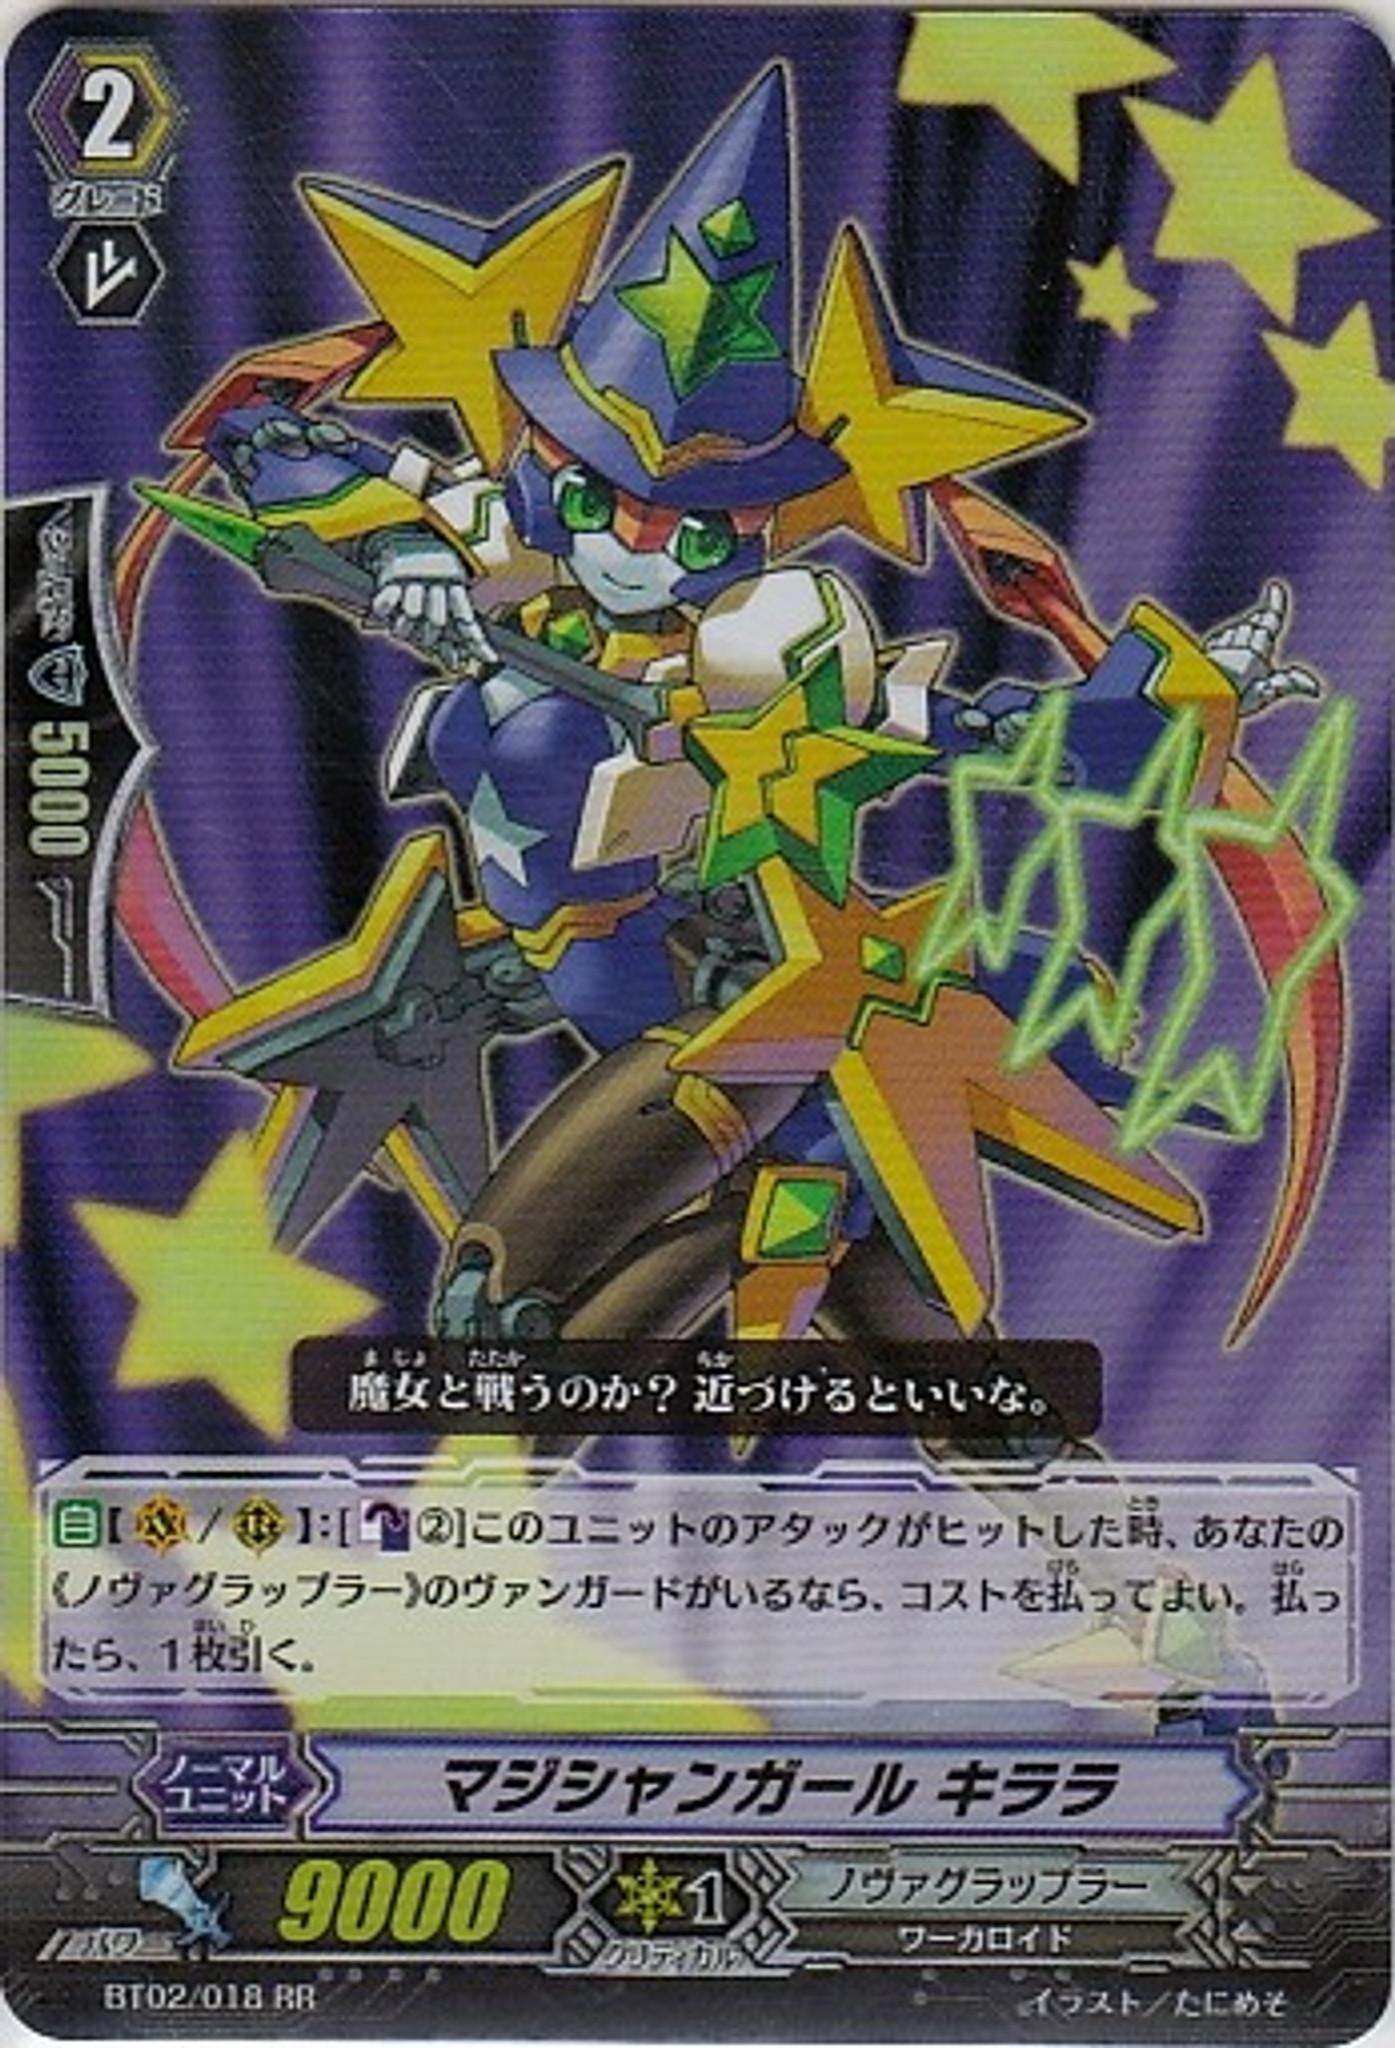 Kirara Mint Cardfight Vanguard TCG Japanese BT02//018 RR Magician Girl